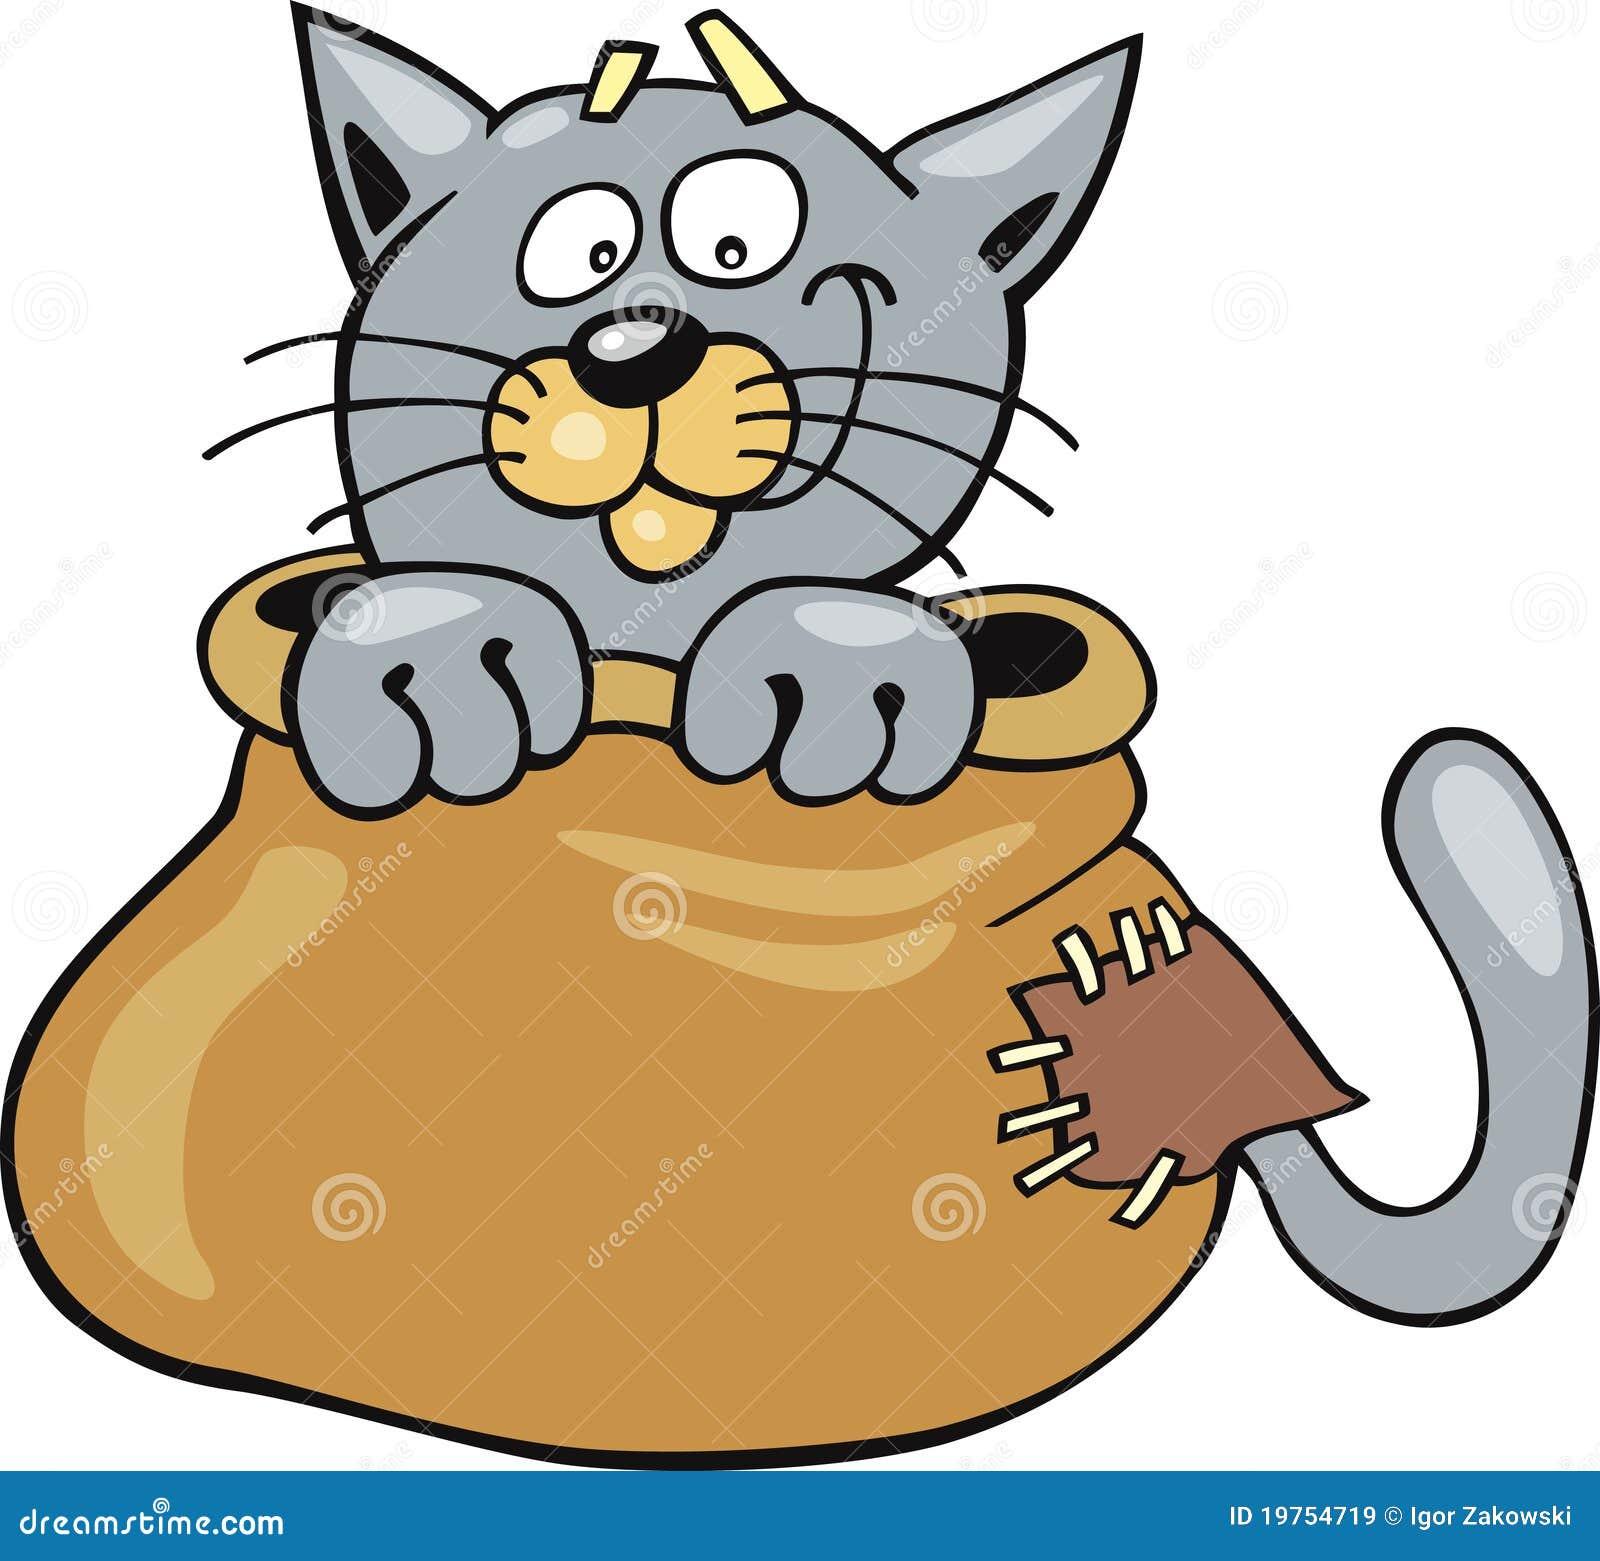 Музыка на конкурс кот в мешке